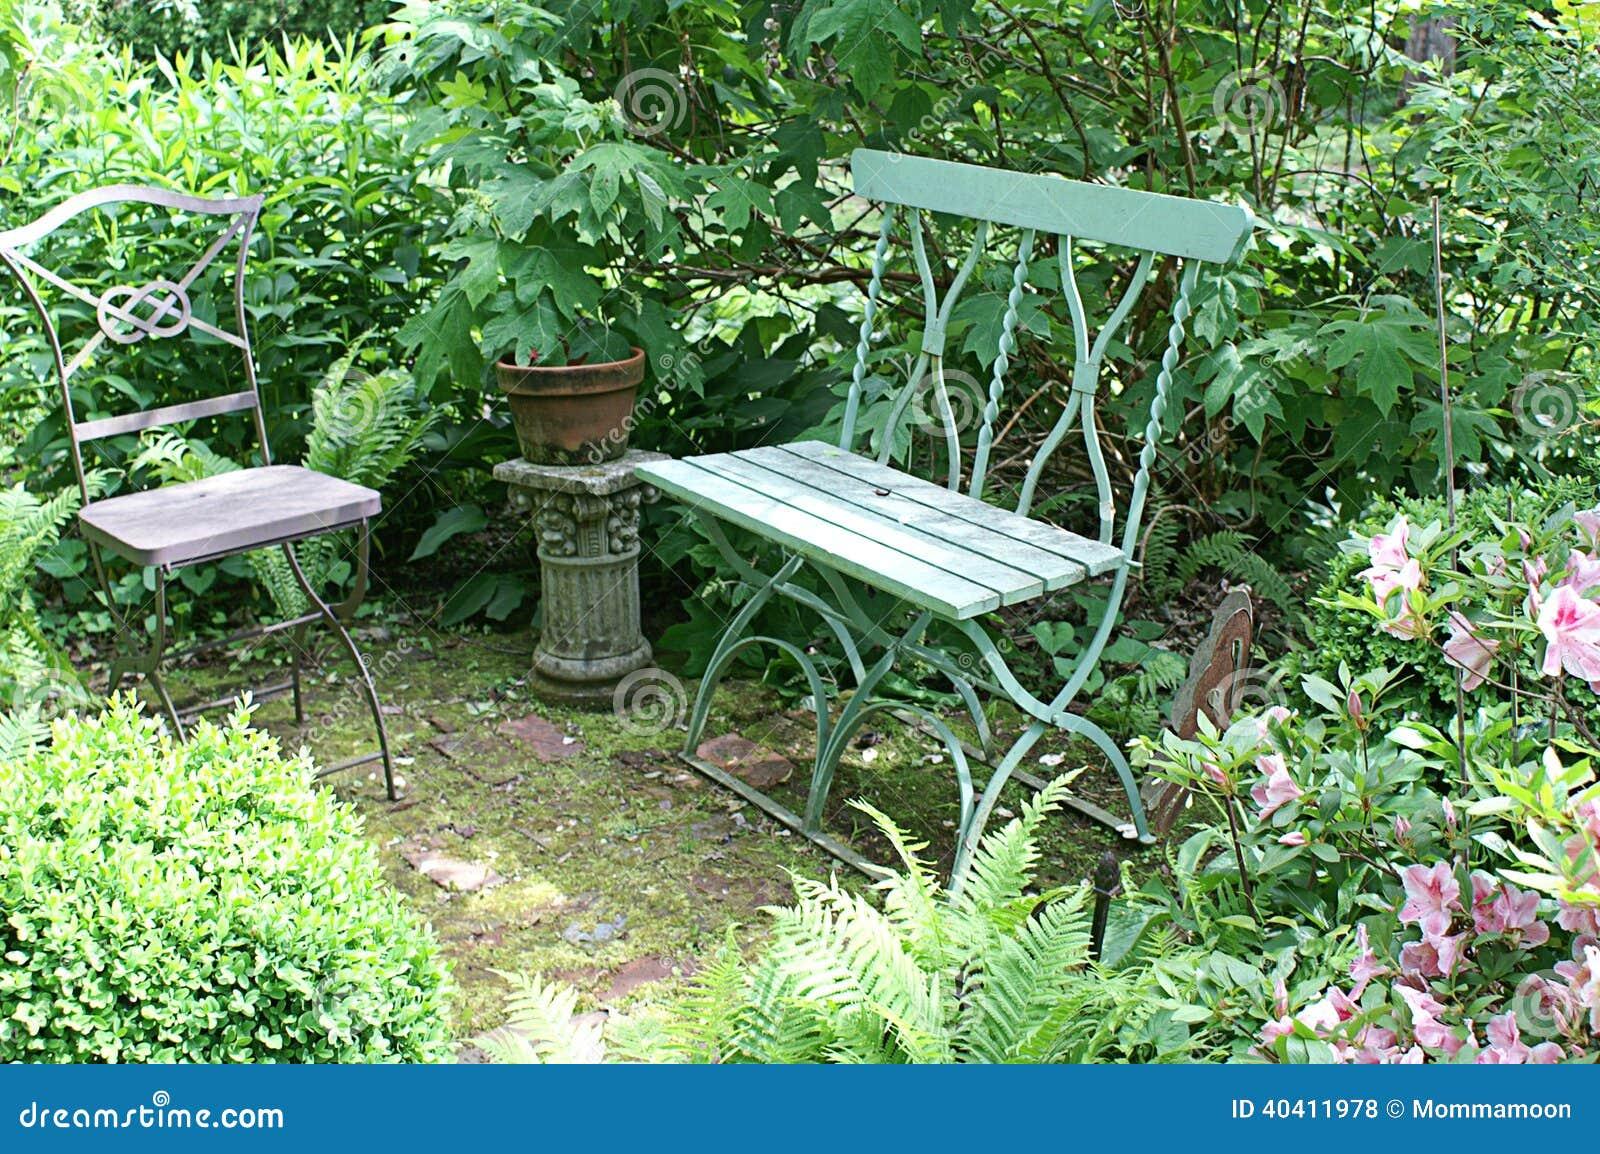 Peaceful Garden Seating Stock Photo - Image: 40411978